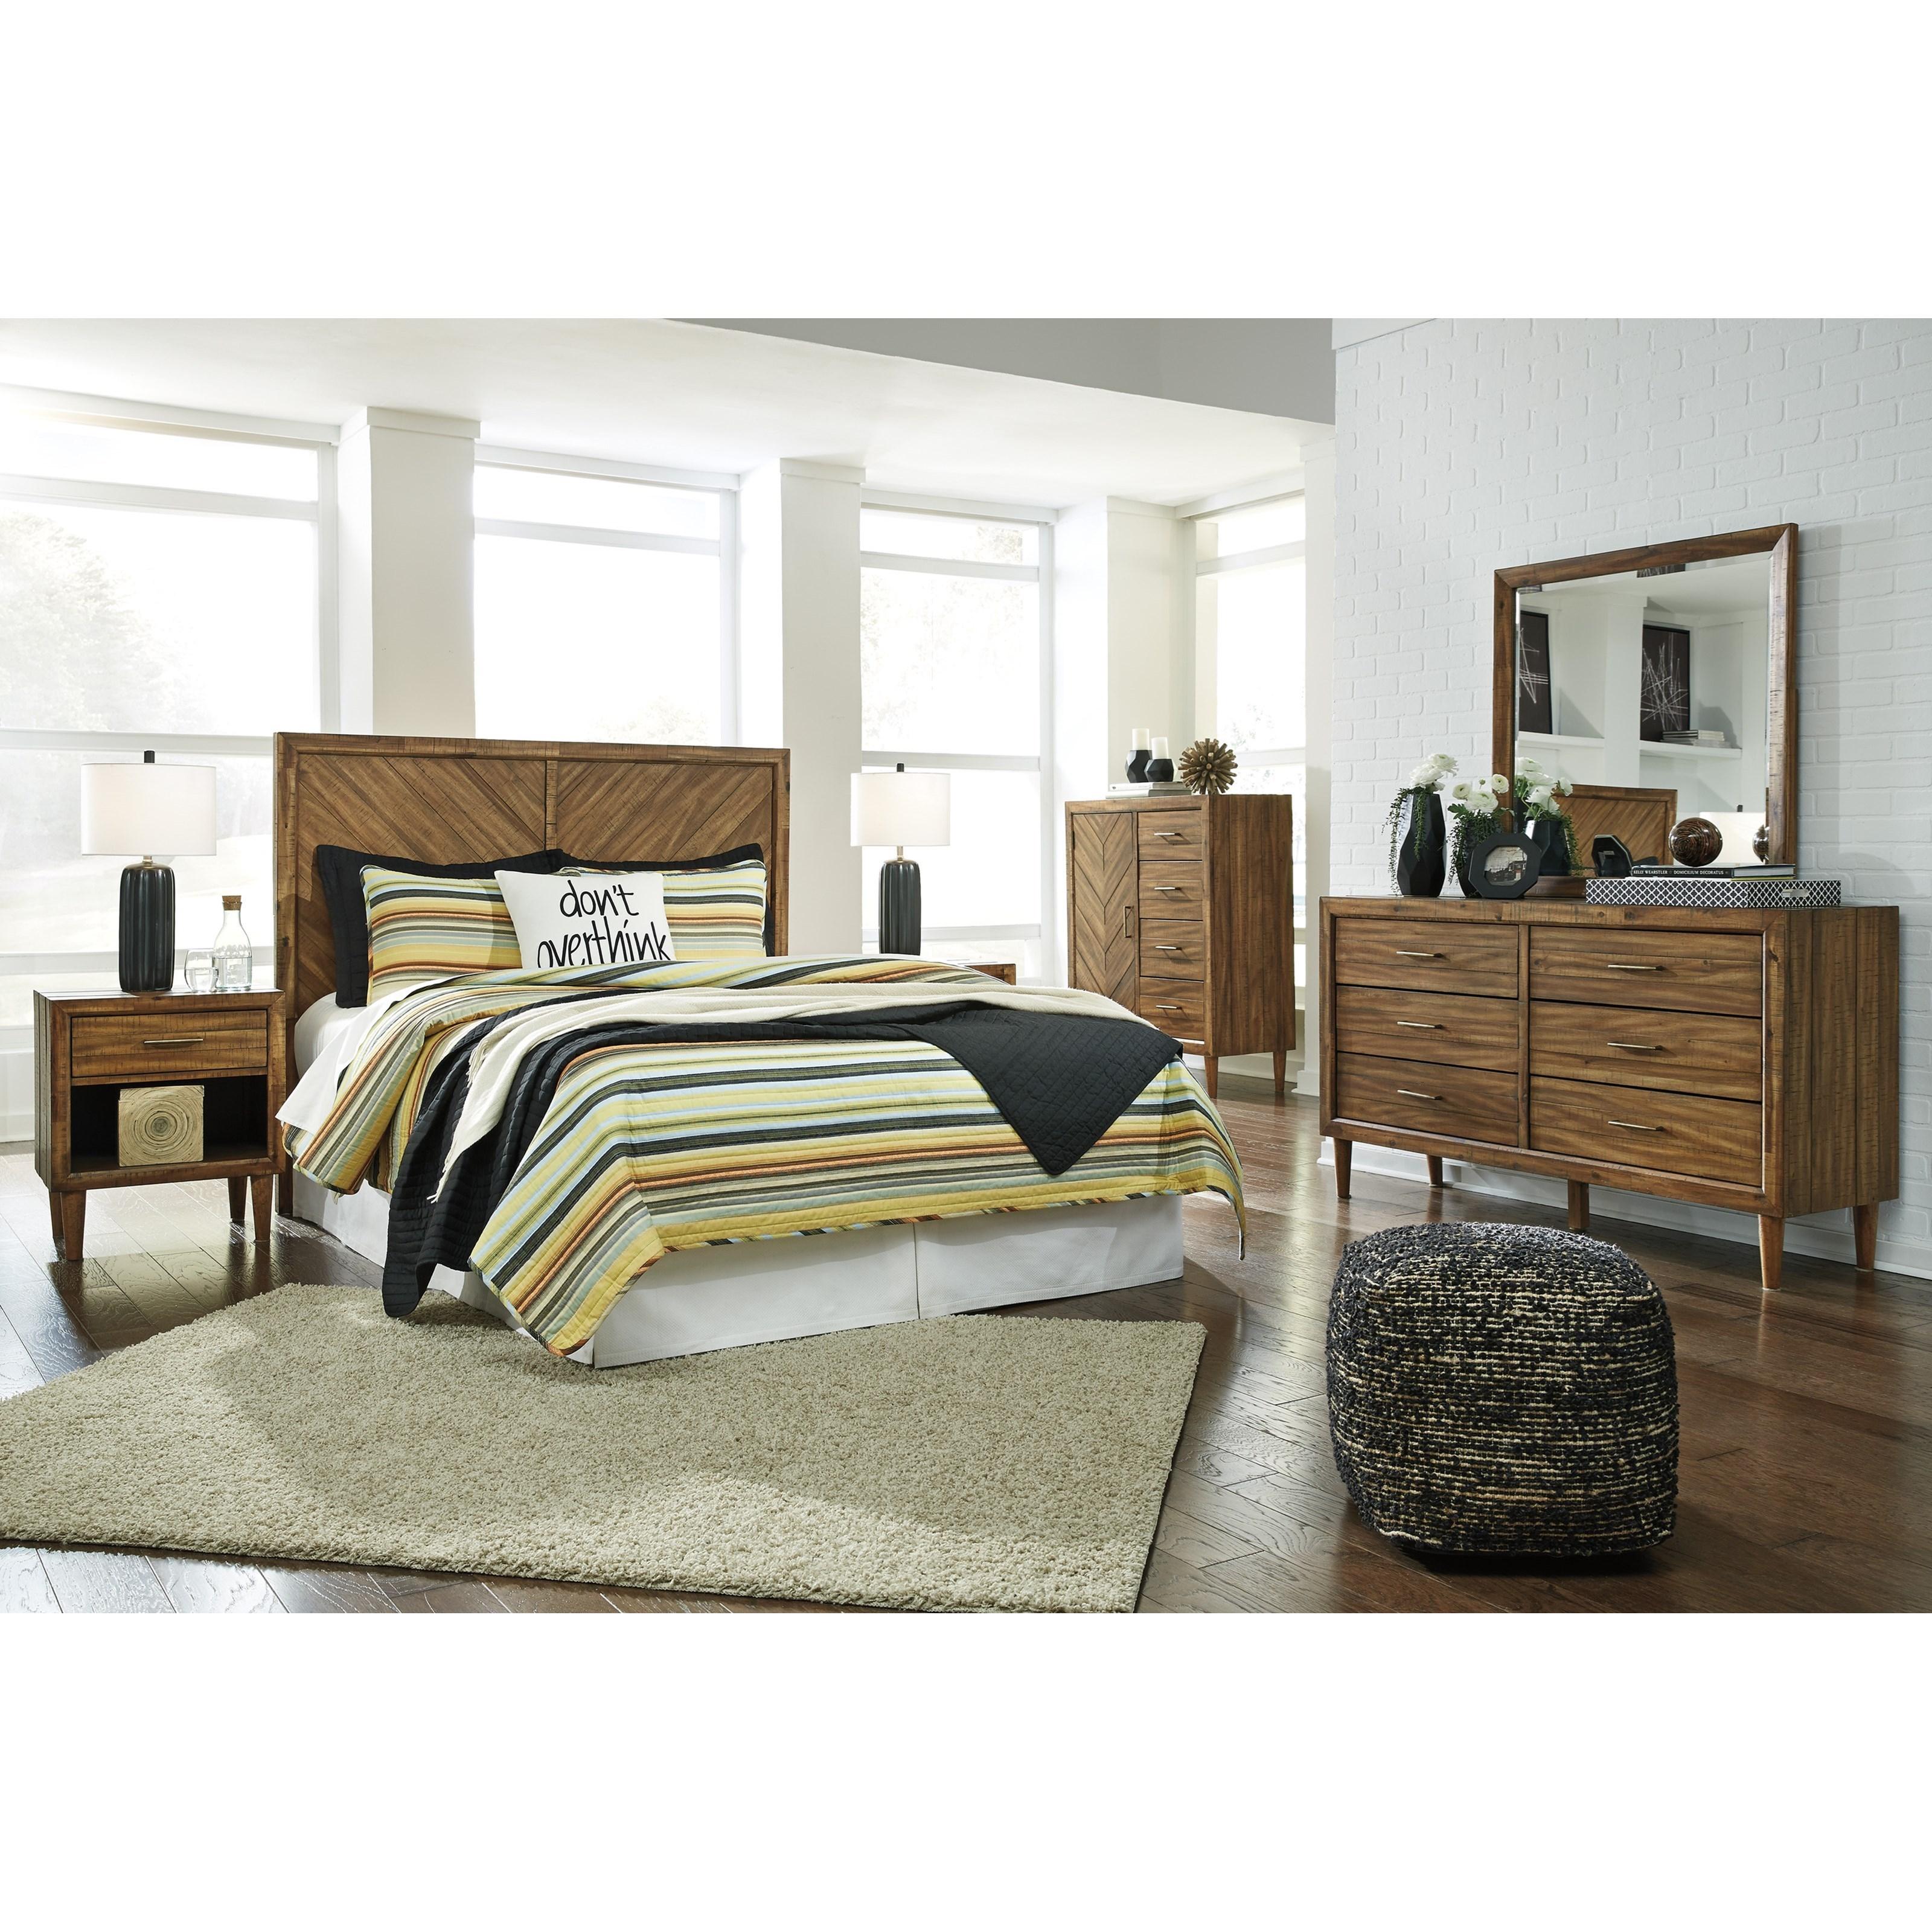 King/California King Bedroom Group